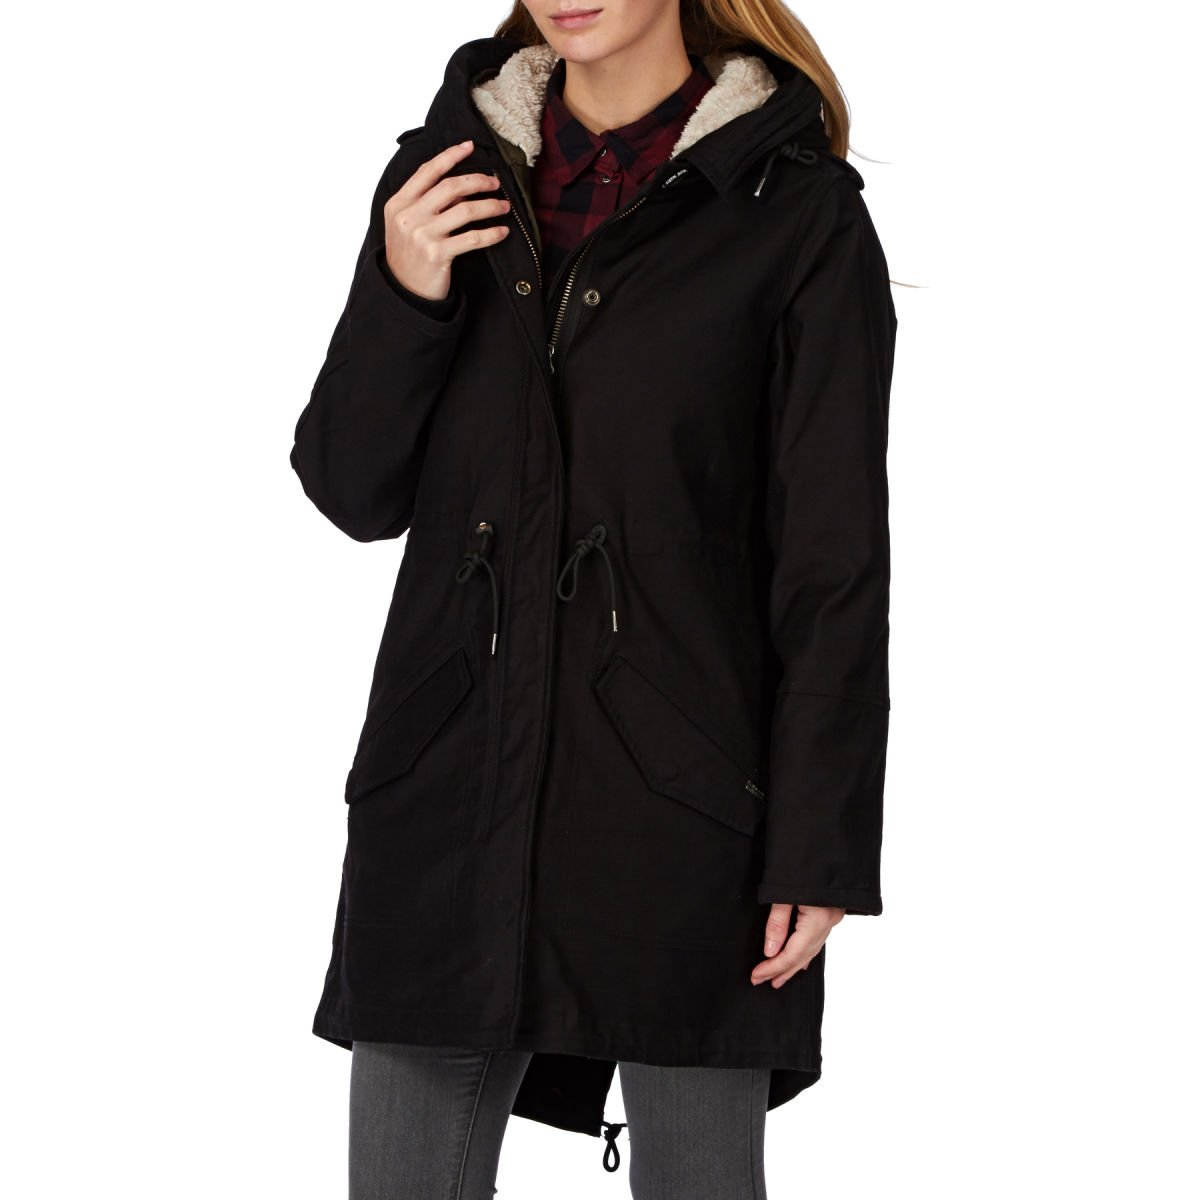 Maison Scotch Parka Jacket – Navy jetzt kaufen